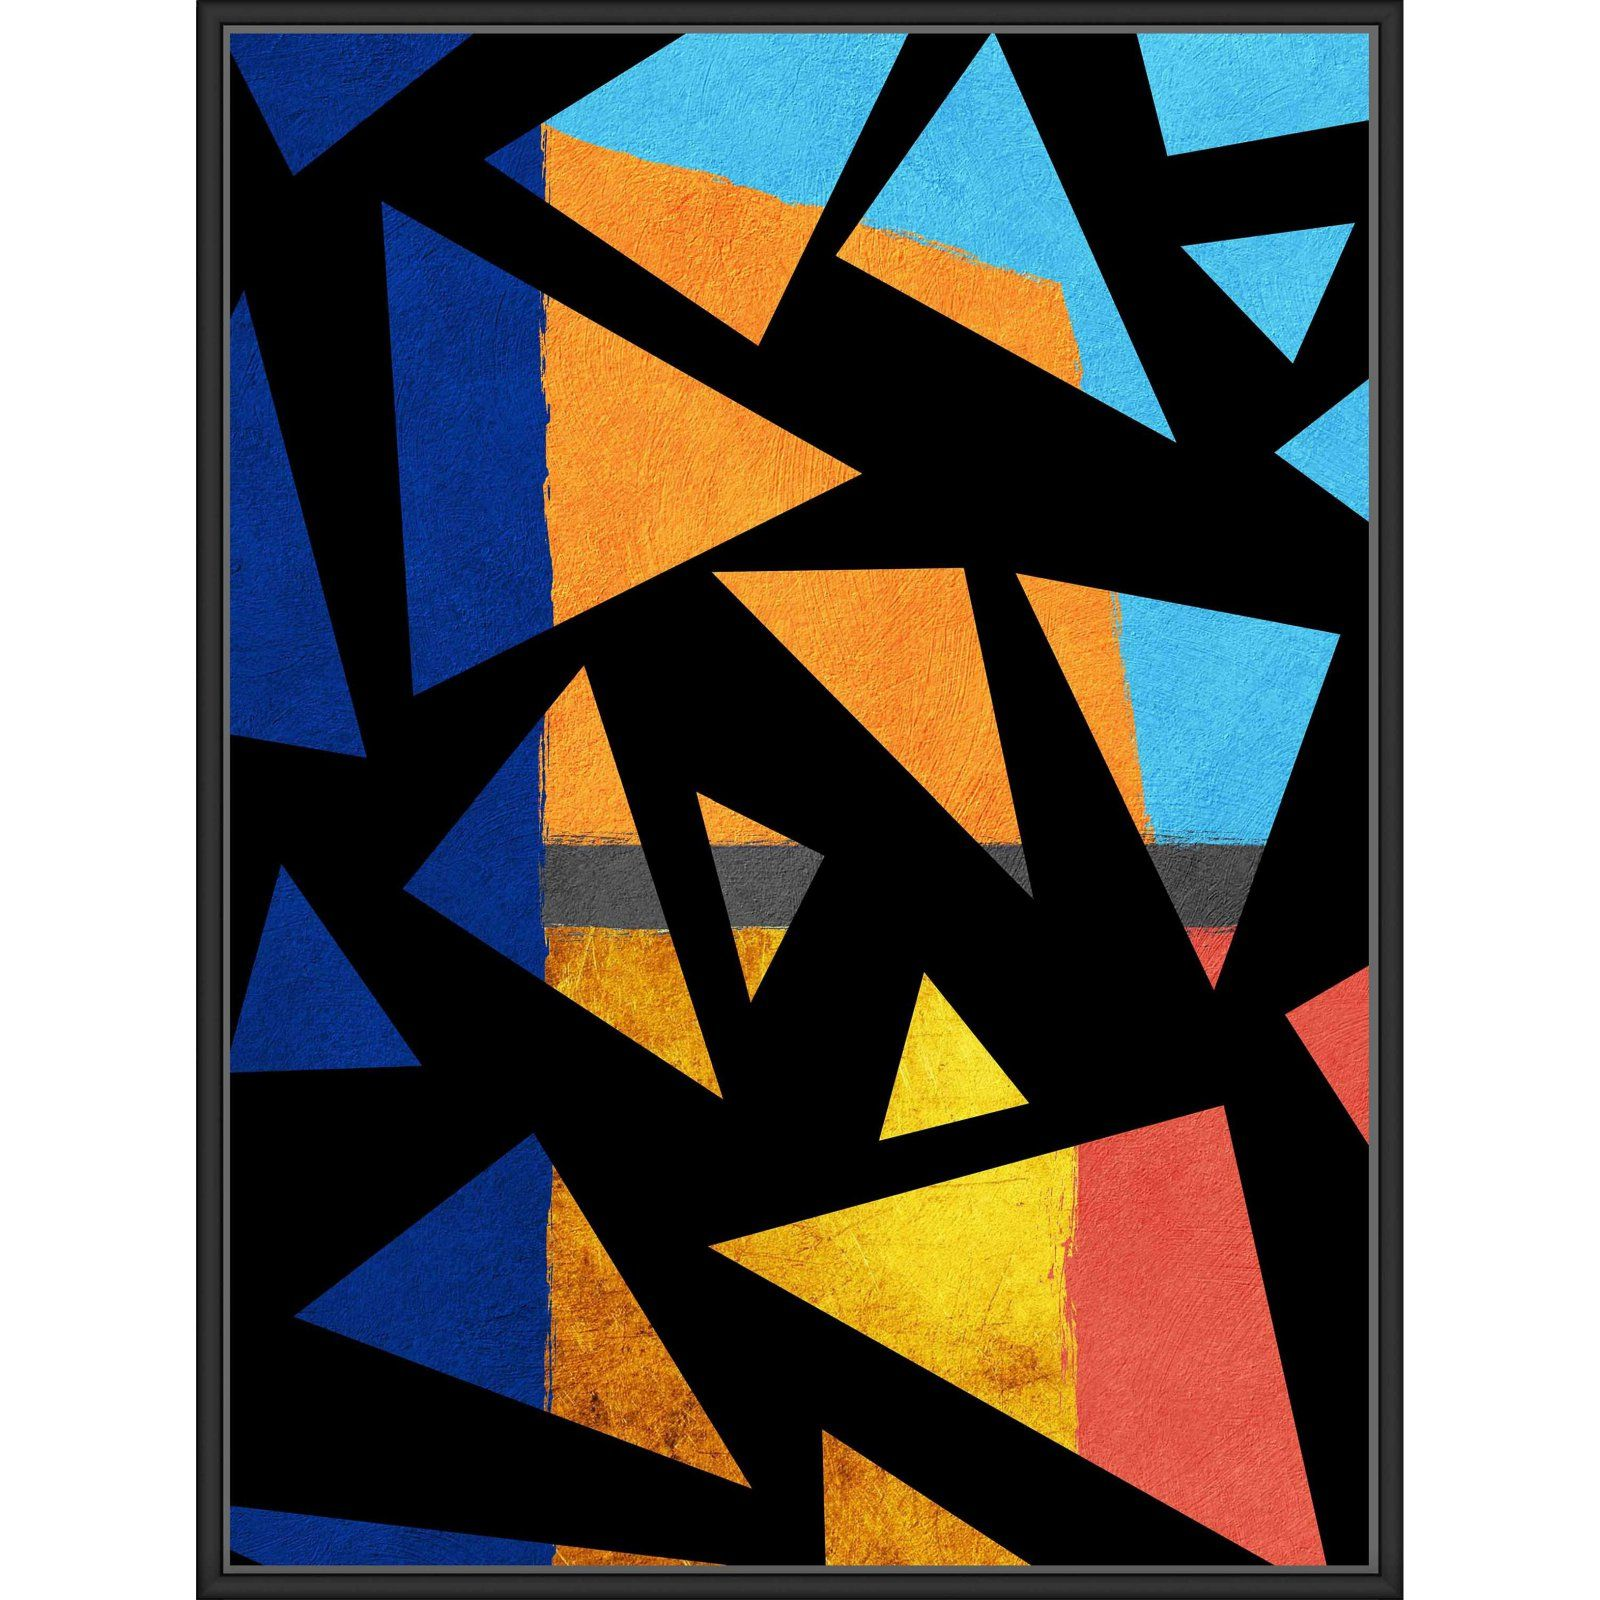 Ptm Images Shaterd Geometry Wall Art Art Graphic Art Print Art Prints